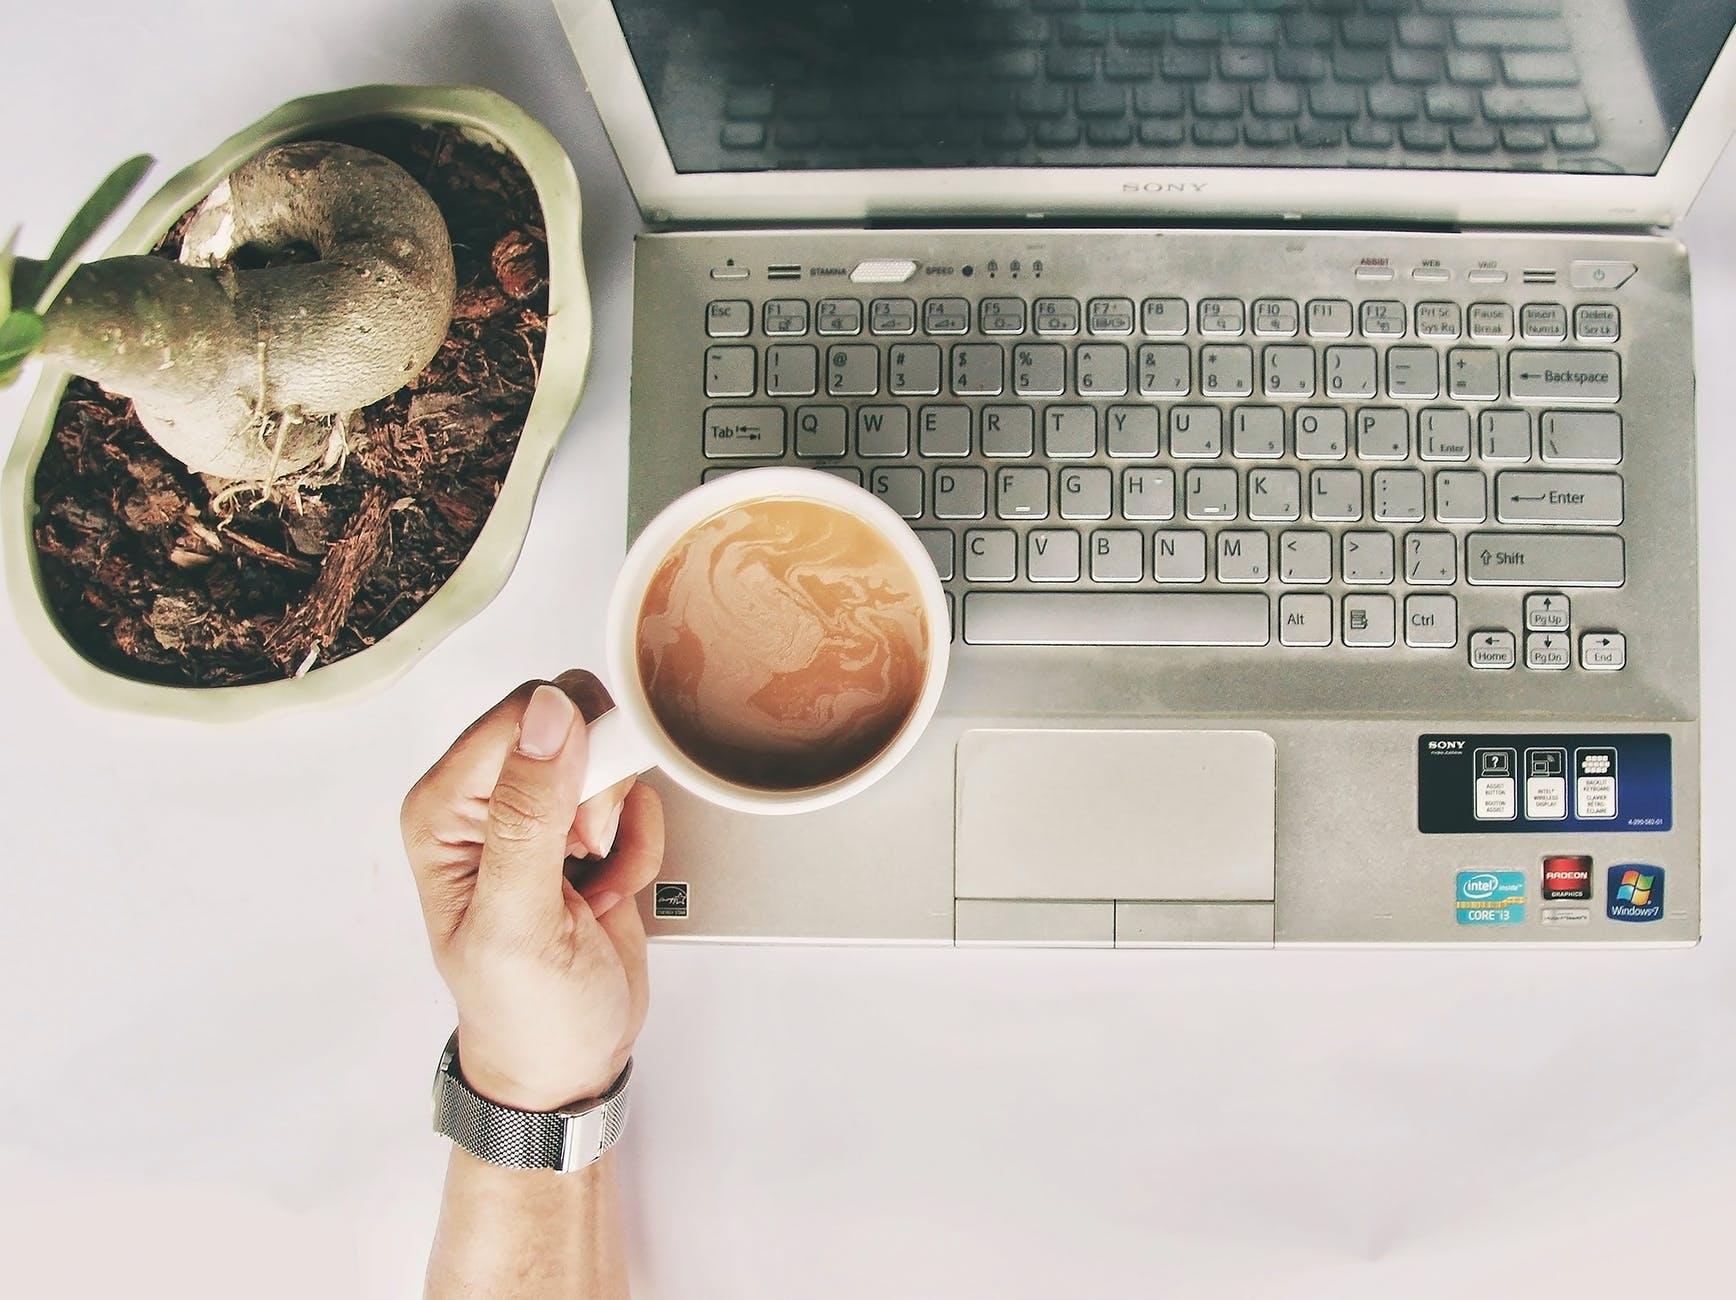 person holding white mug on gray laptop computer